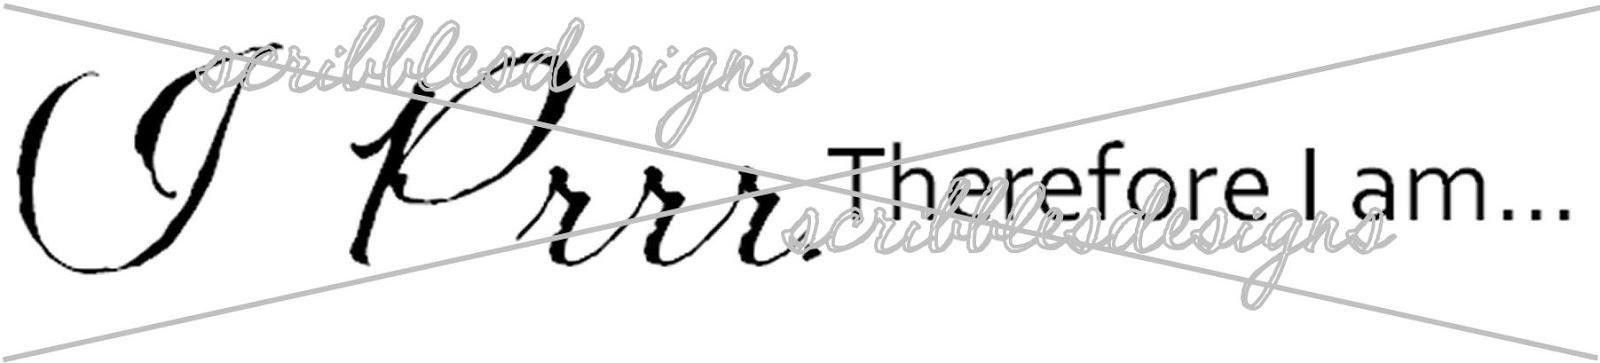 http://buyscribblesdesigns.blogspot.com/2015/02/0110-i-prrr-100.html